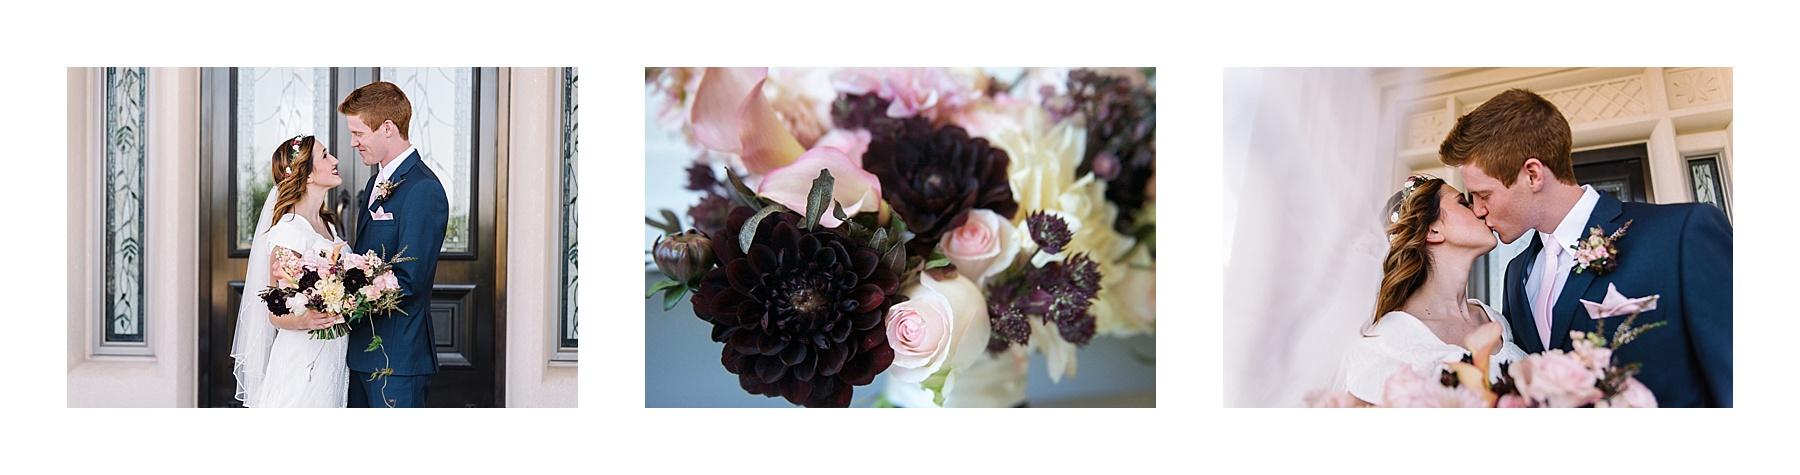 blush-burgandy-bouquet_0634.jpg